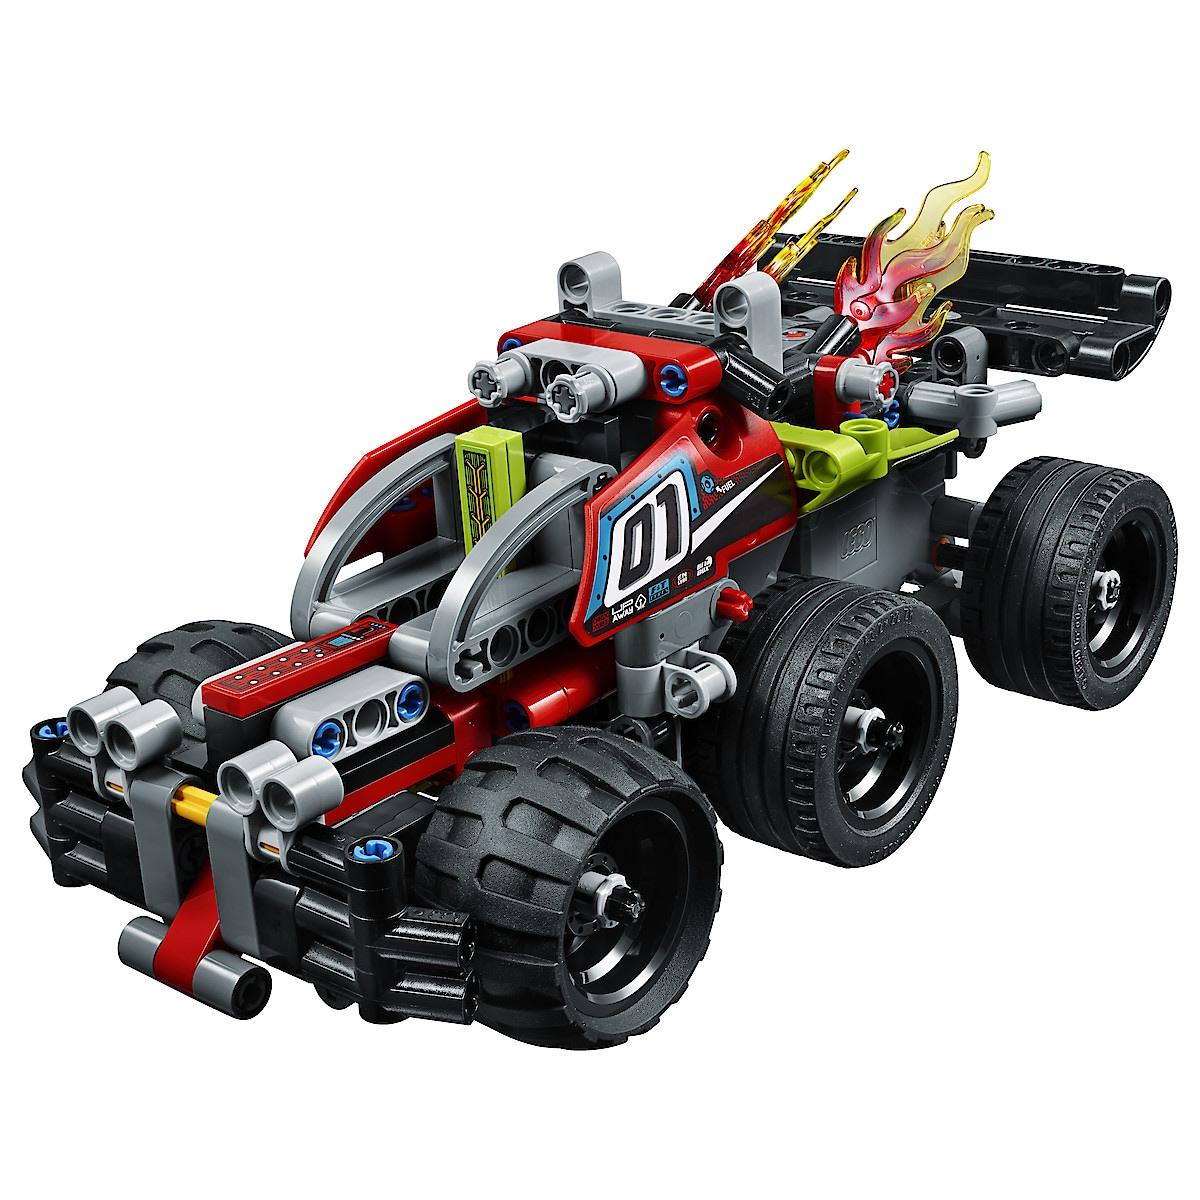 LEGO Technic 42073, BUMMS!